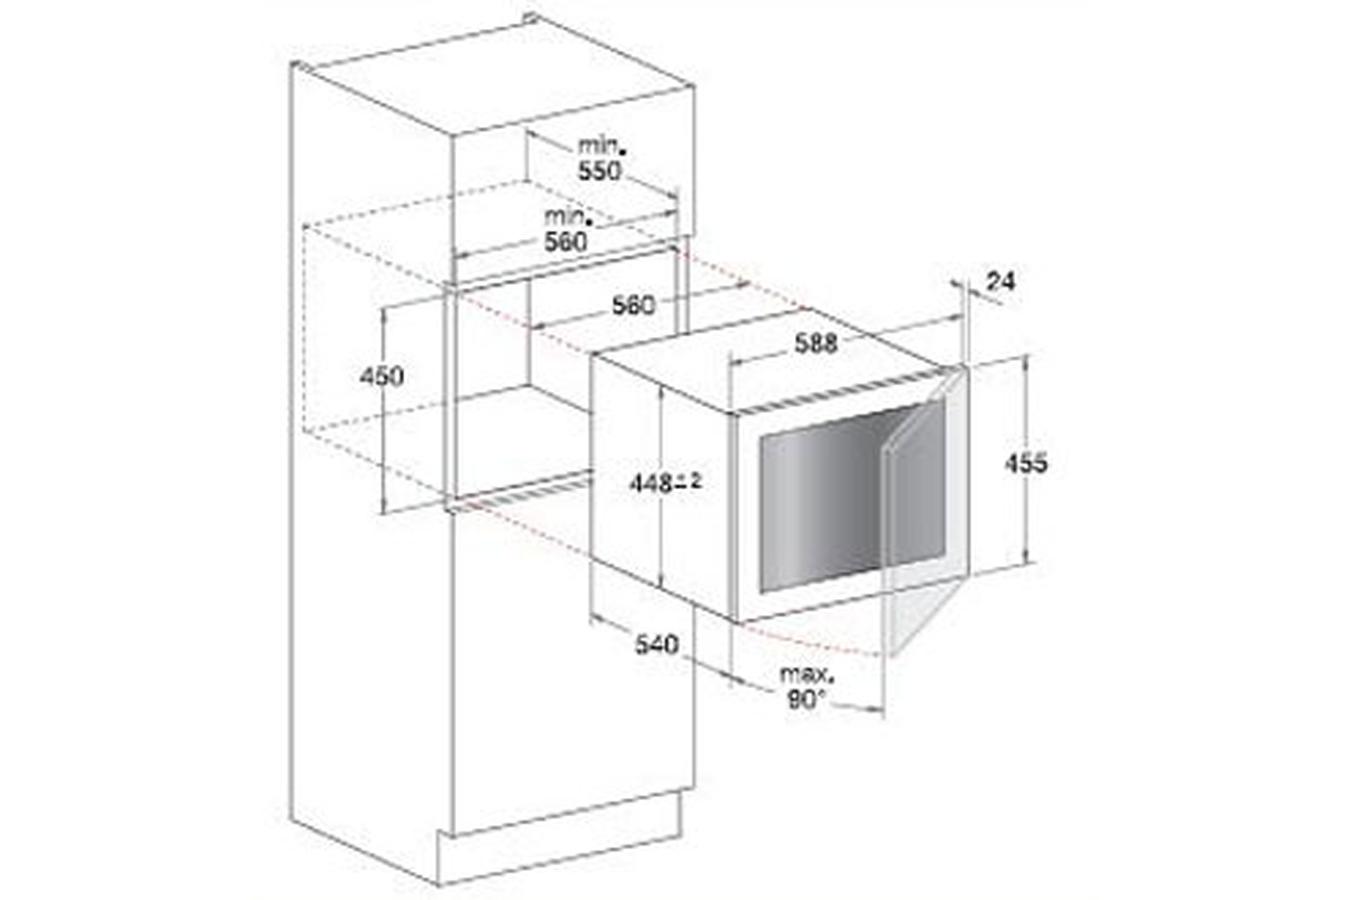 cave a vin encastrable scholtes sp xv 24 inox sp xv 24. Black Bedroom Furniture Sets. Home Design Ideas